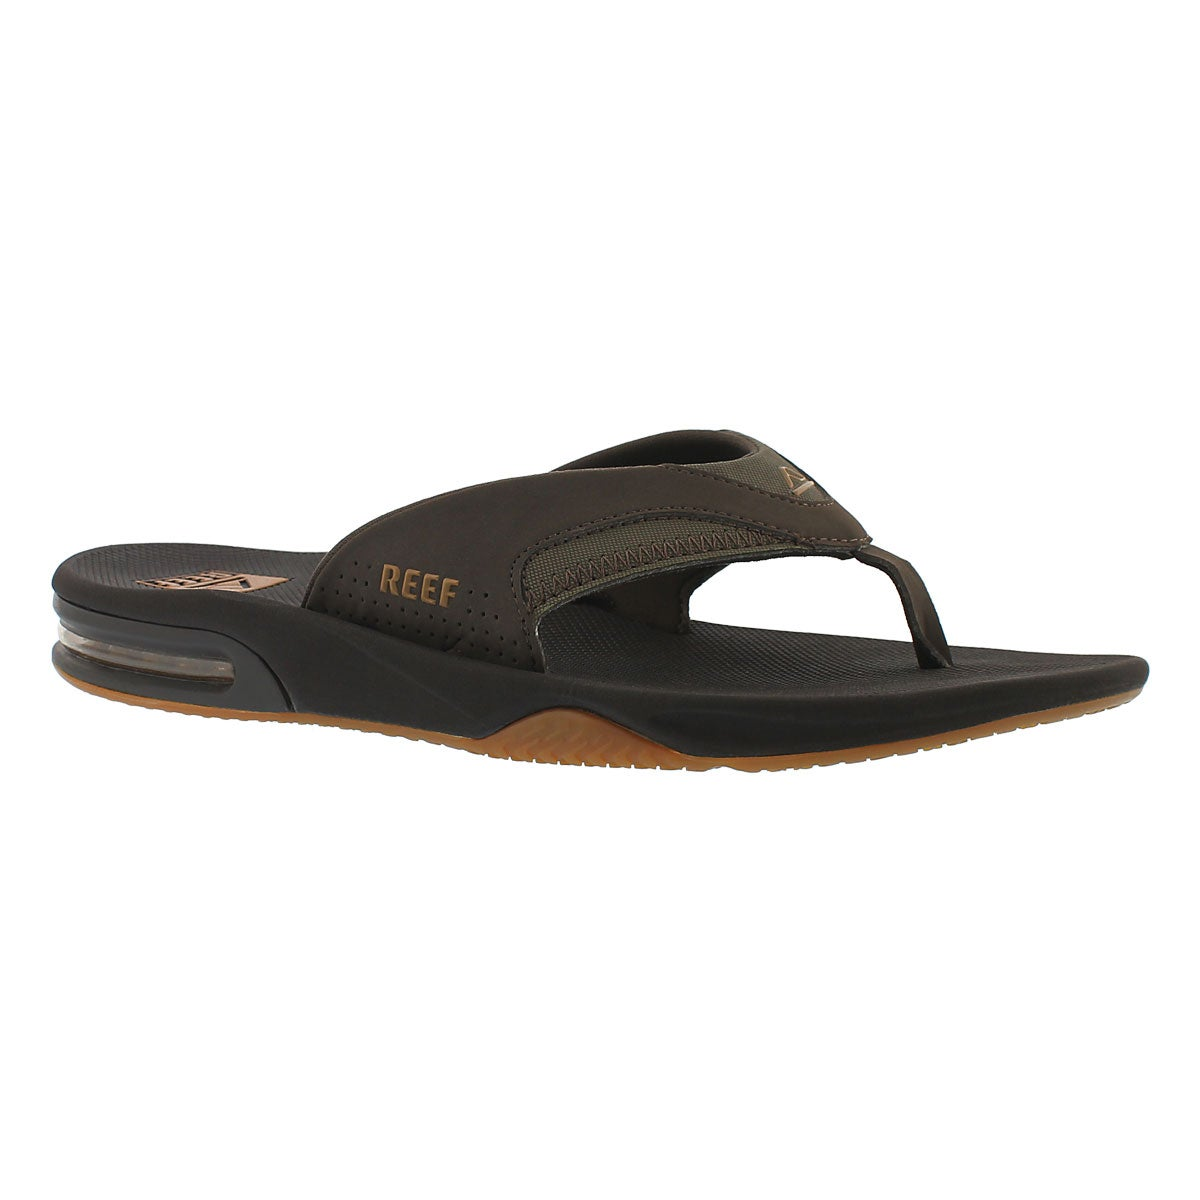 Mns Fanning brown/gum thong sandal